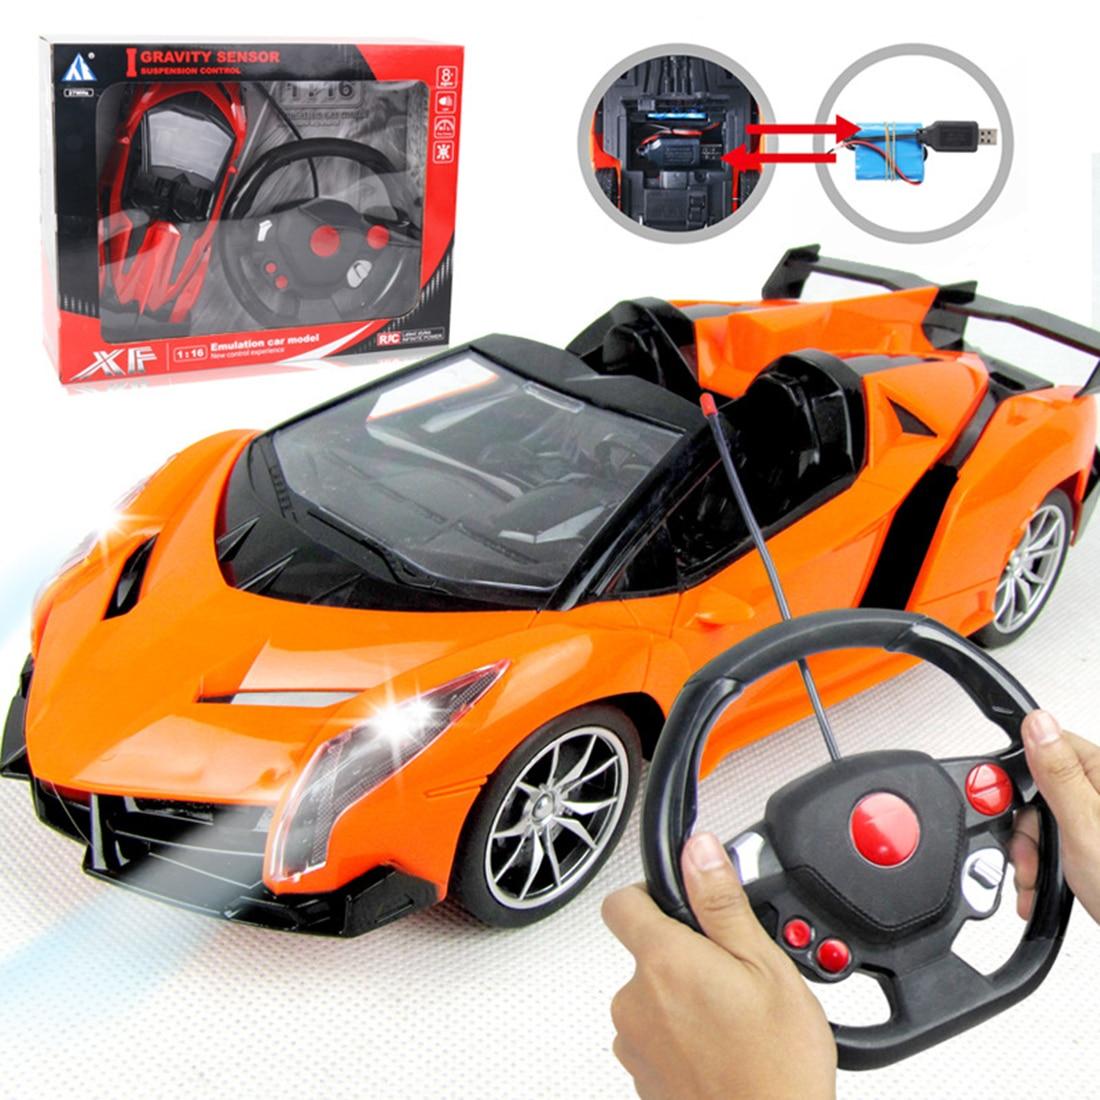 116 28cm 27MHZ Children RC Car Toy Grativity Sensor Electric Four-channel Wireless RC Drift Car Steering Wheel Remote Control